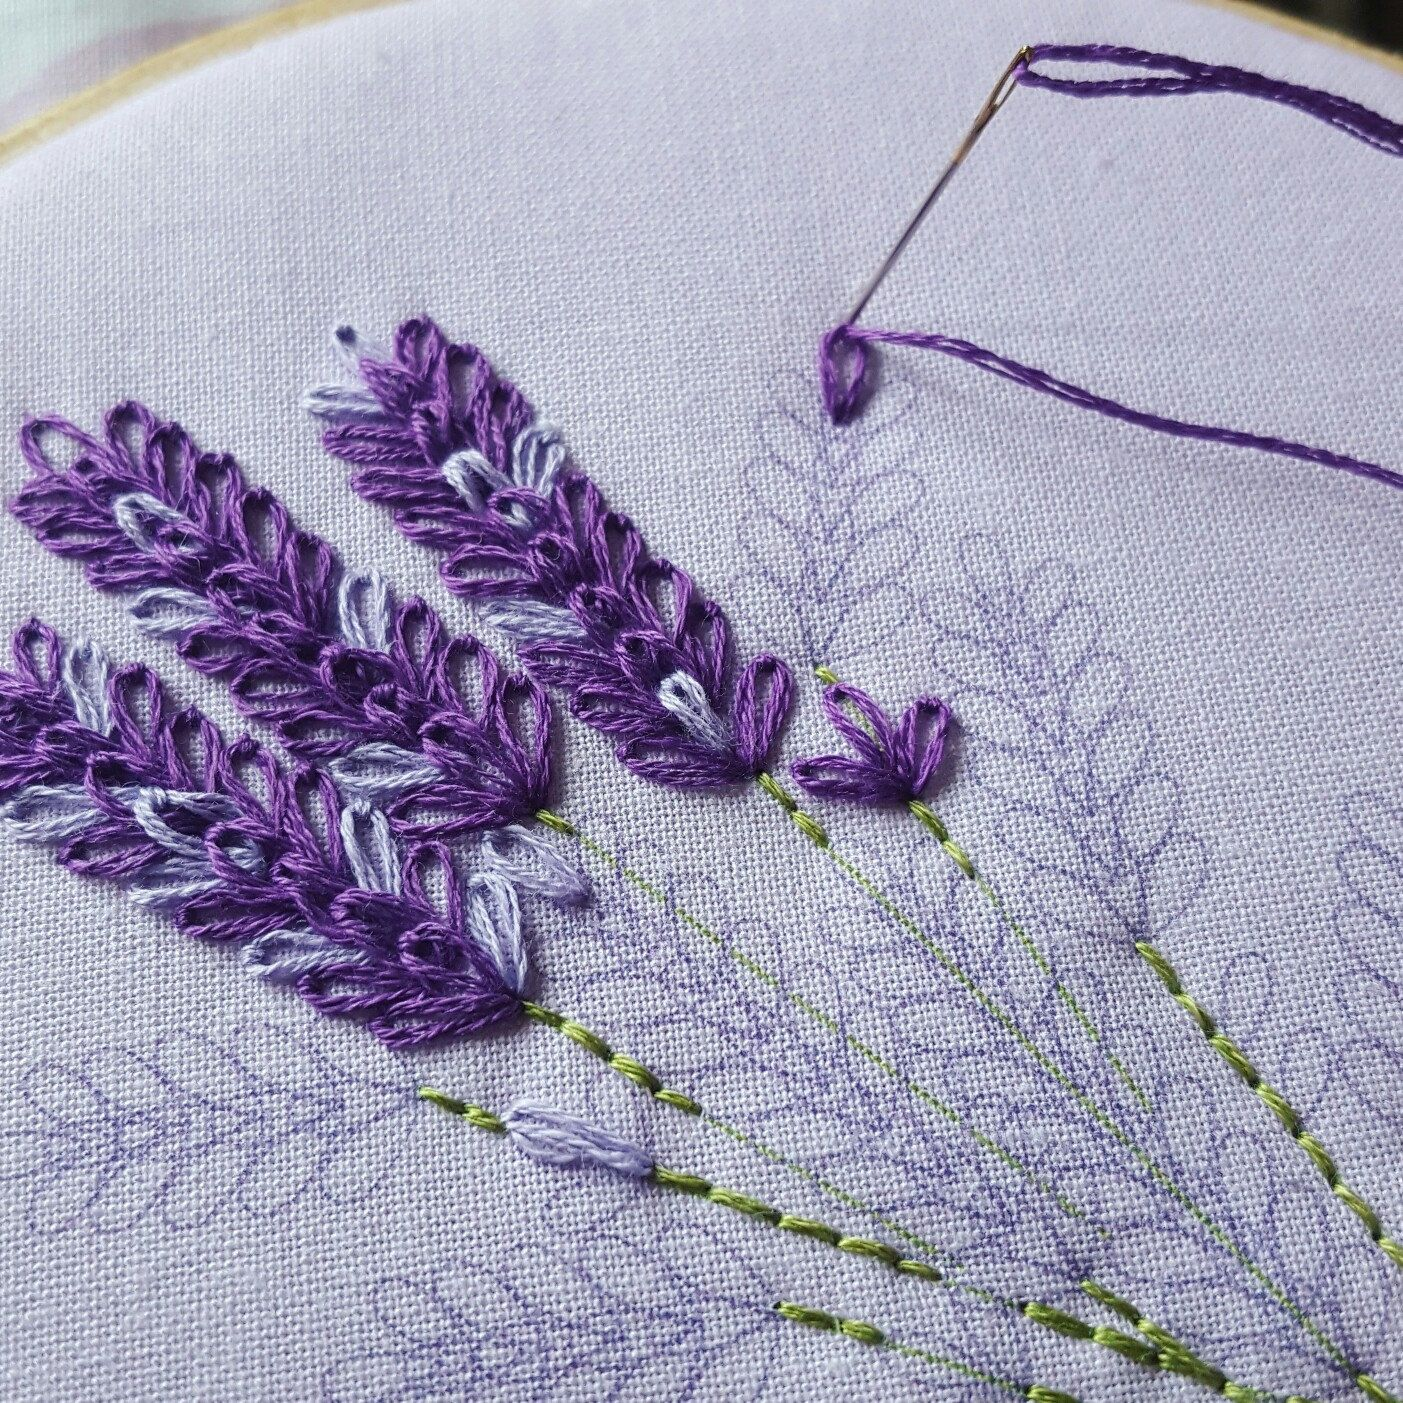 Lavender embroidery kit floral embroidery set wildflowers hoop art